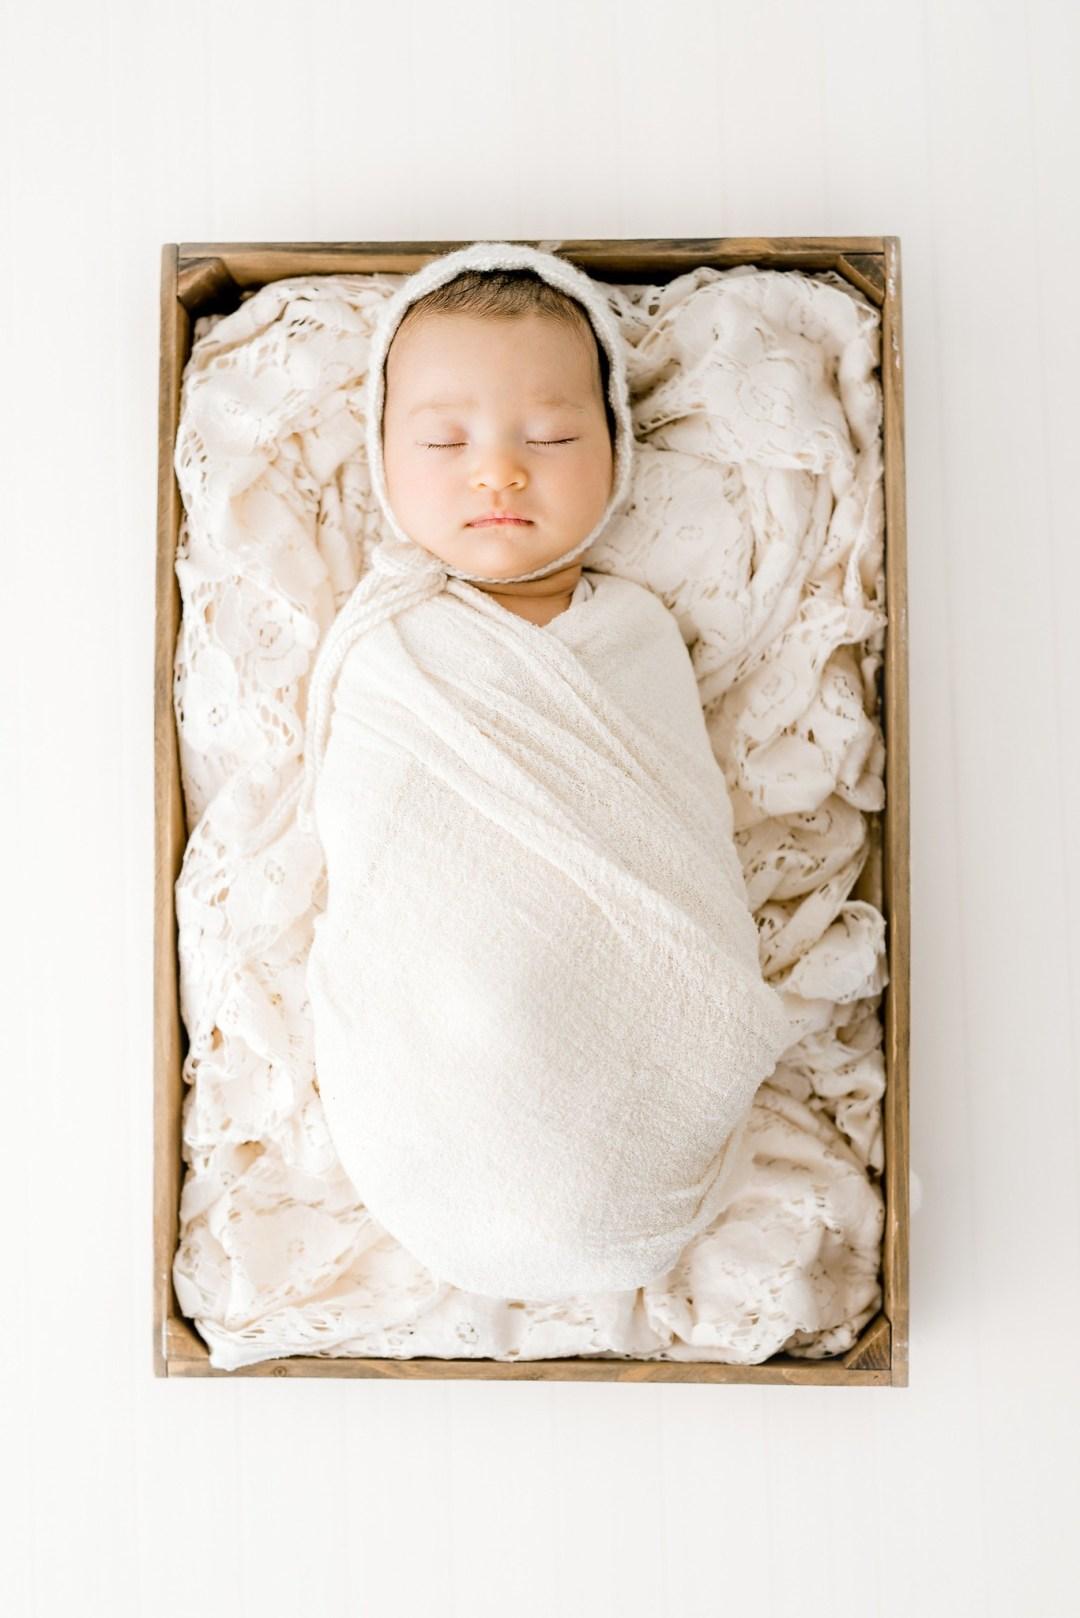 Newborn Photoshoot - Les Soufflet